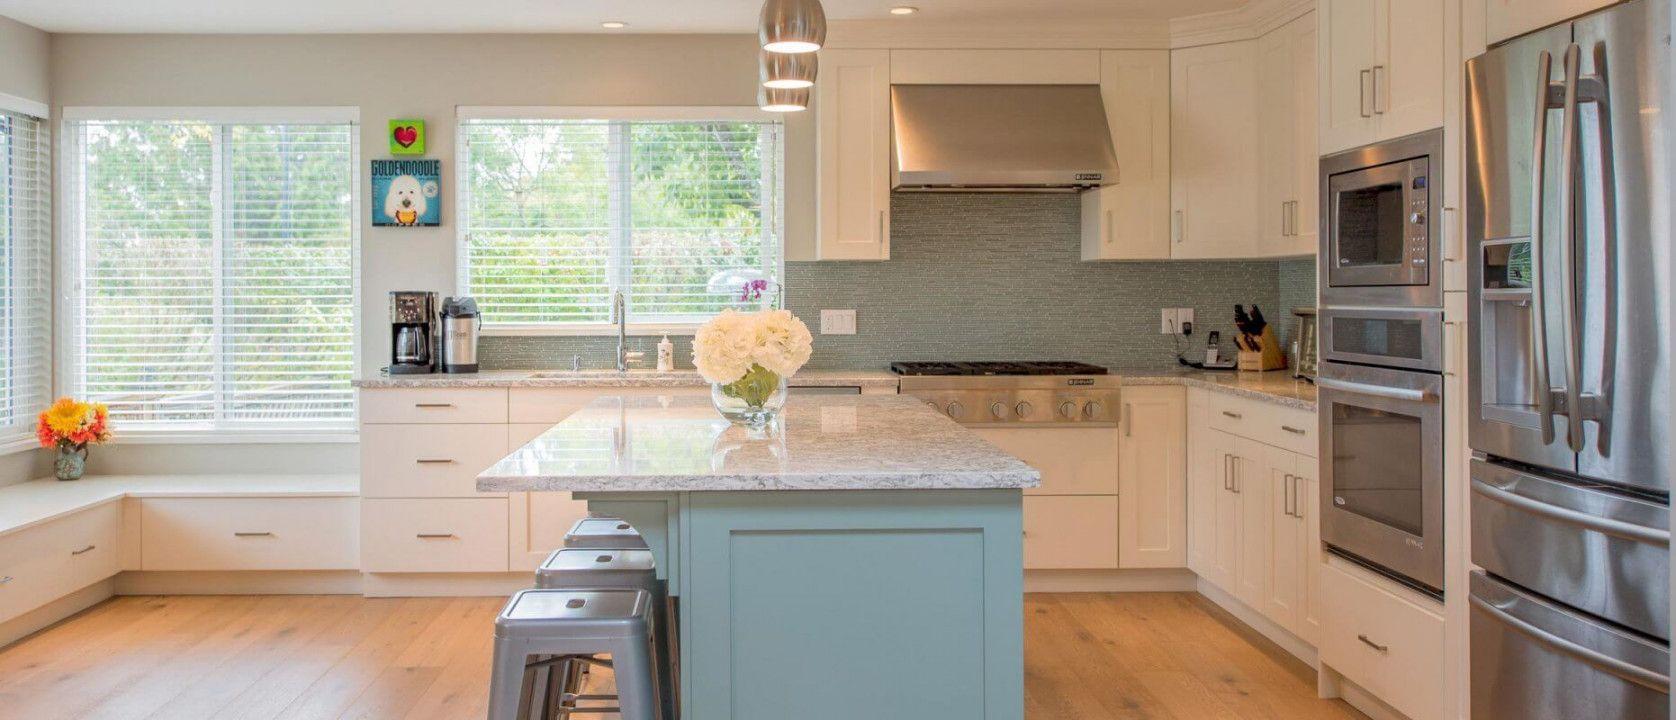 Charmant 2018 Dewils Cabinets Vancouver Wa   Kitchen Decor Theme Ideas Check More At  Http:/